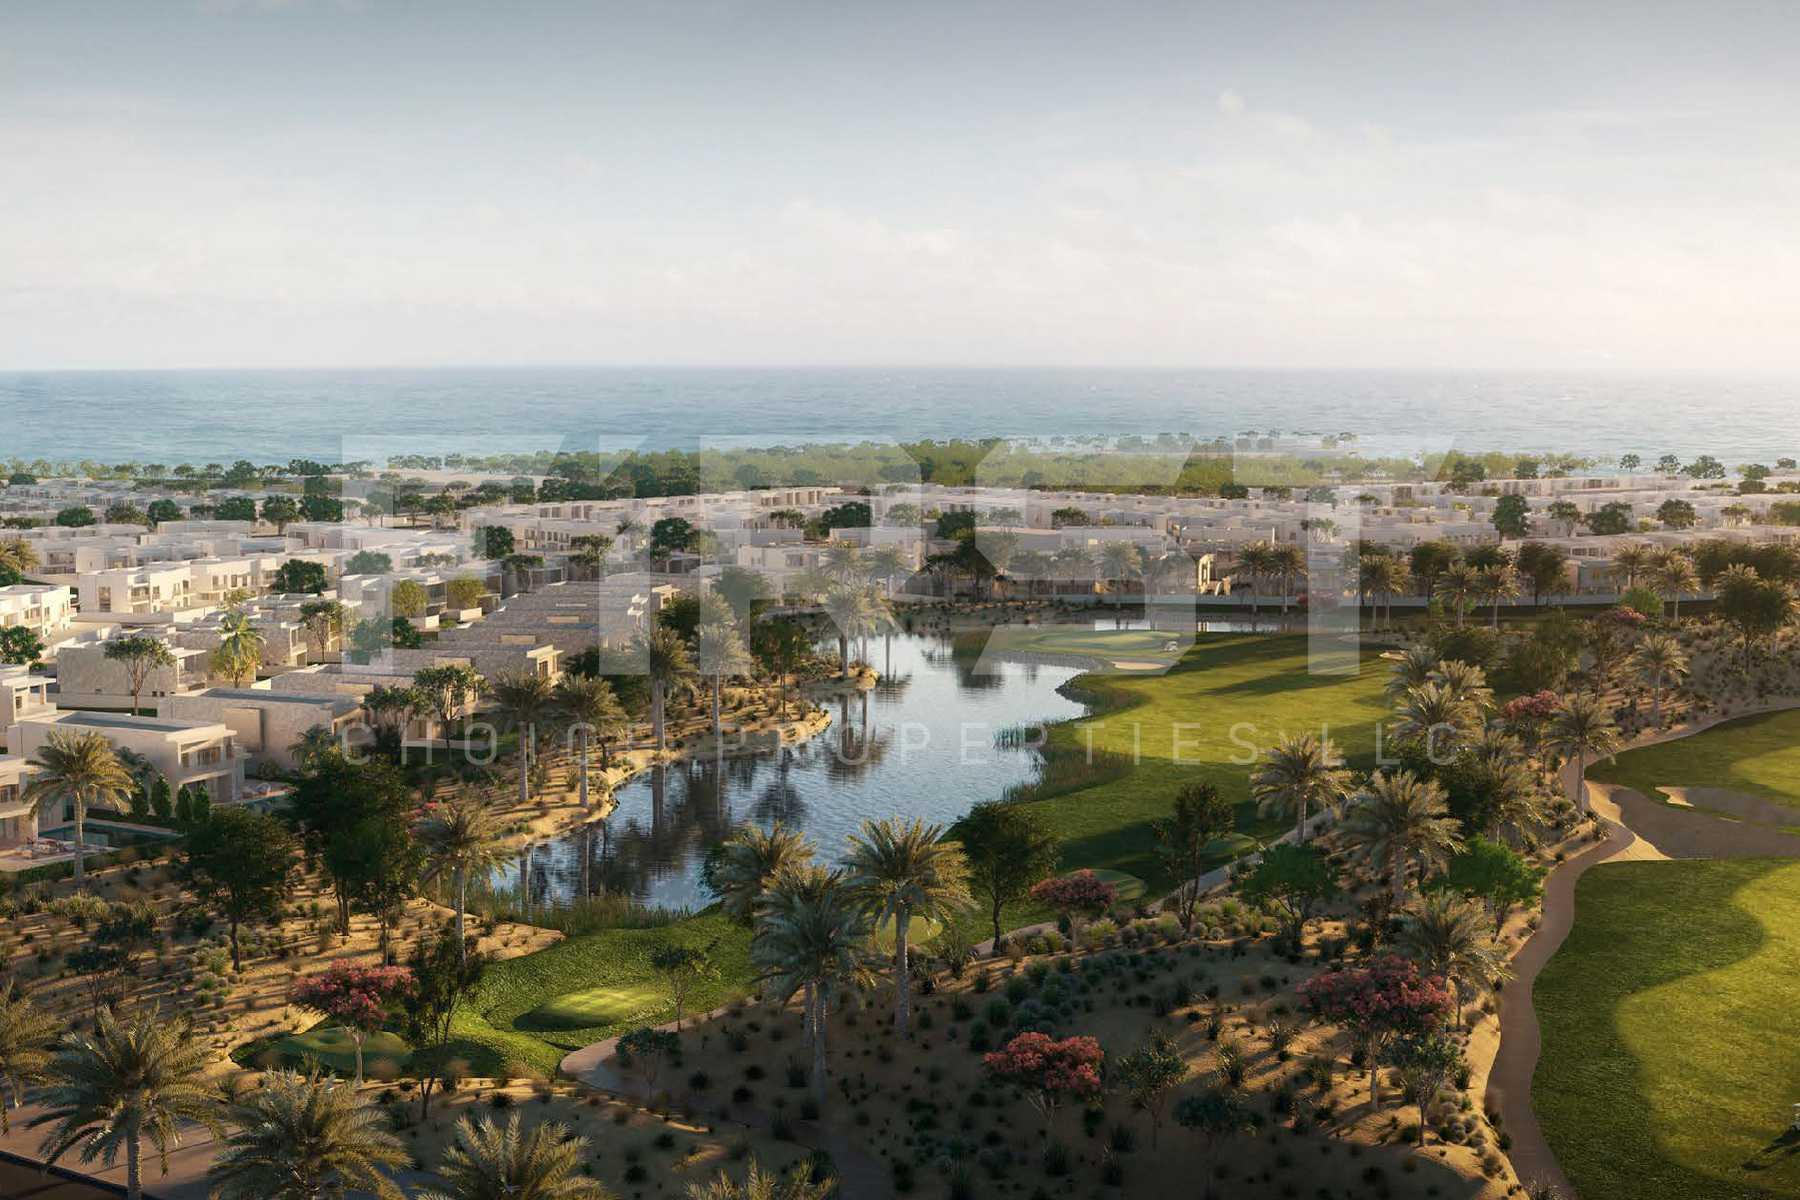 External Photo of Yas Acres Yas Island Abu Dhabi UAE (2).jpg